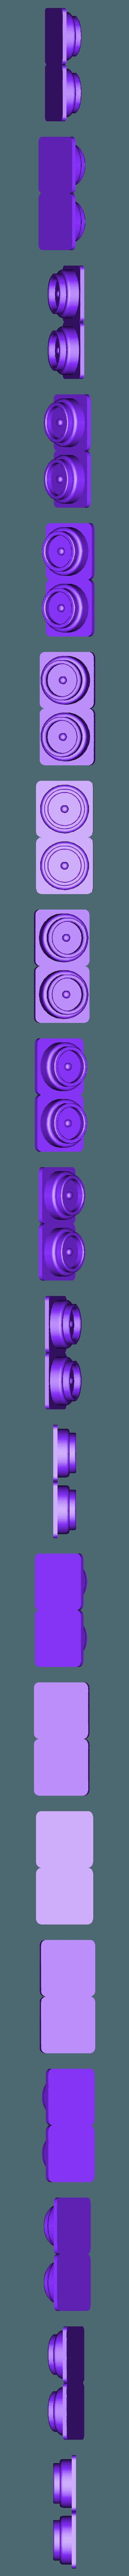 side_buttons_3_x2.stl Download free STL file ORCA communicator (Godzilla) • 3D printing object, poblocki1982